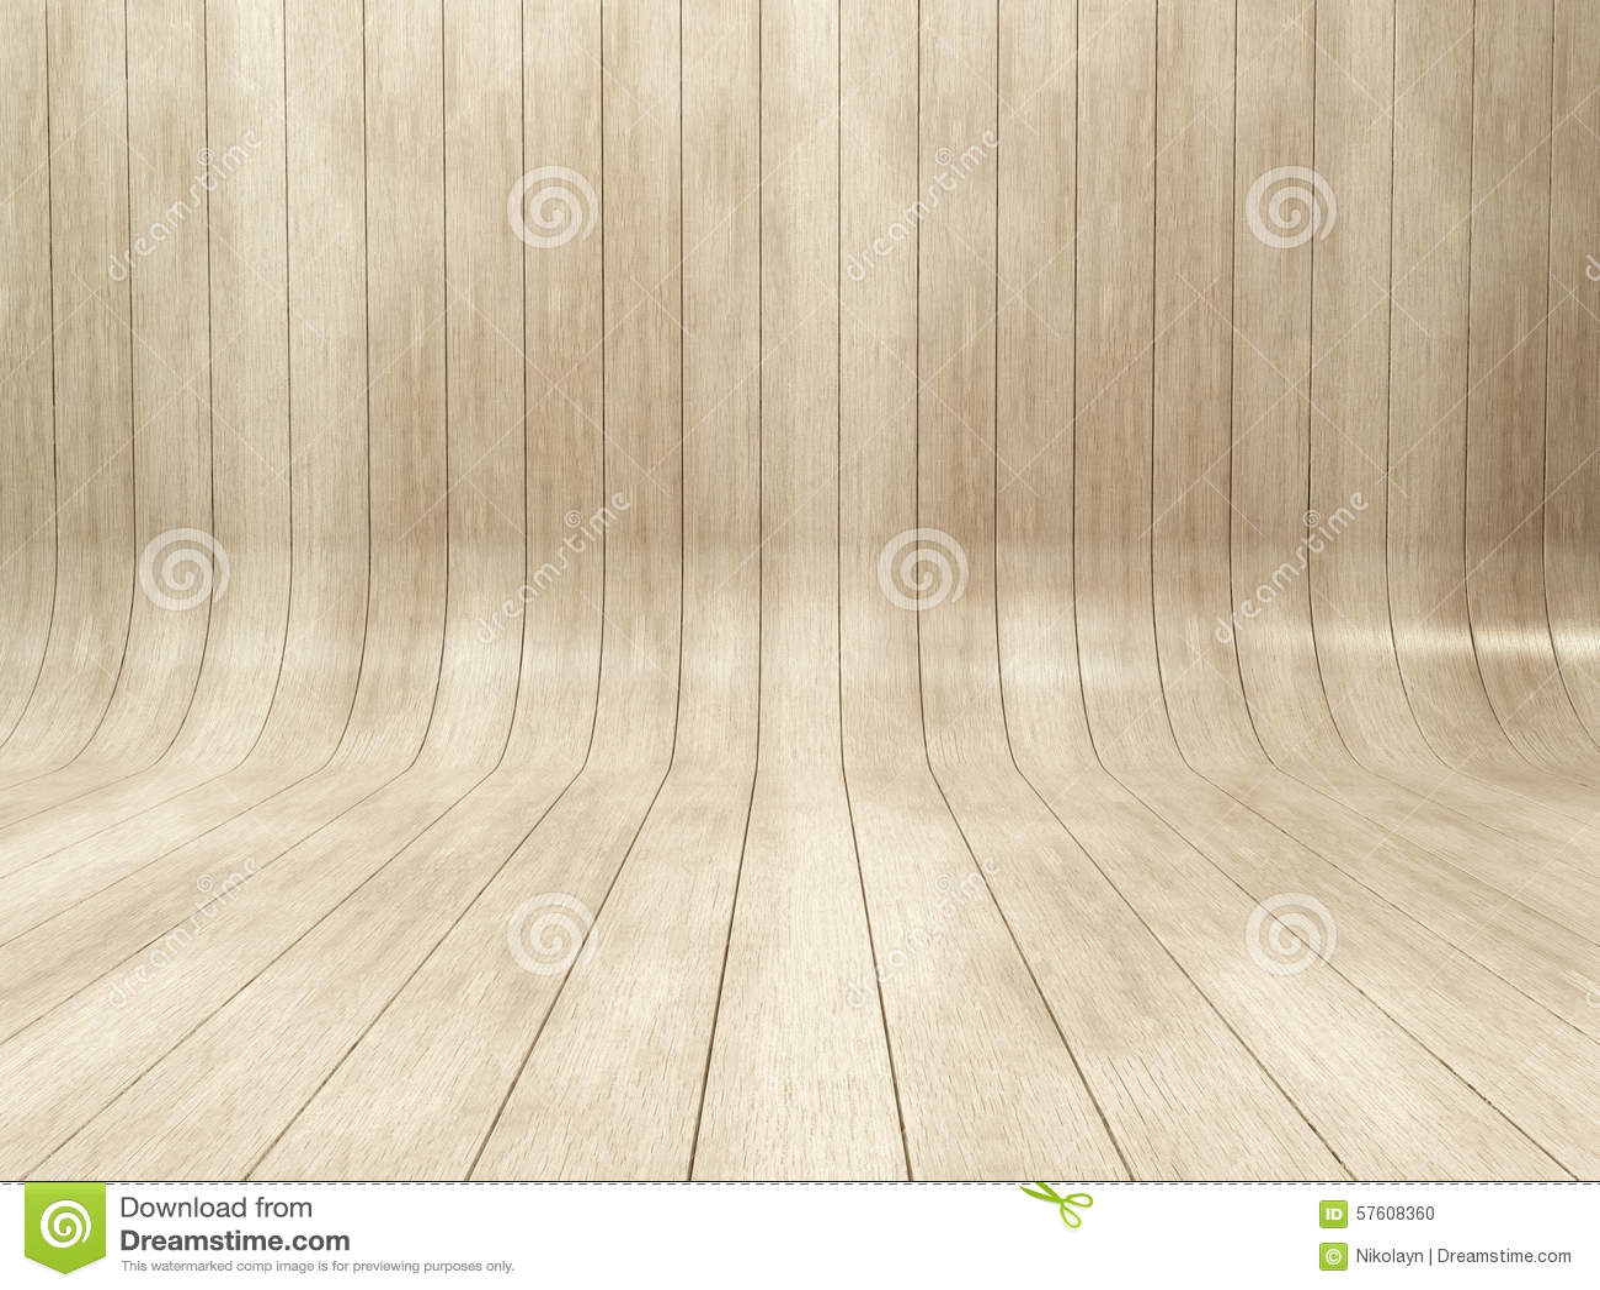 fond en bois blanchi de chêne photo stock - image du bois, planche